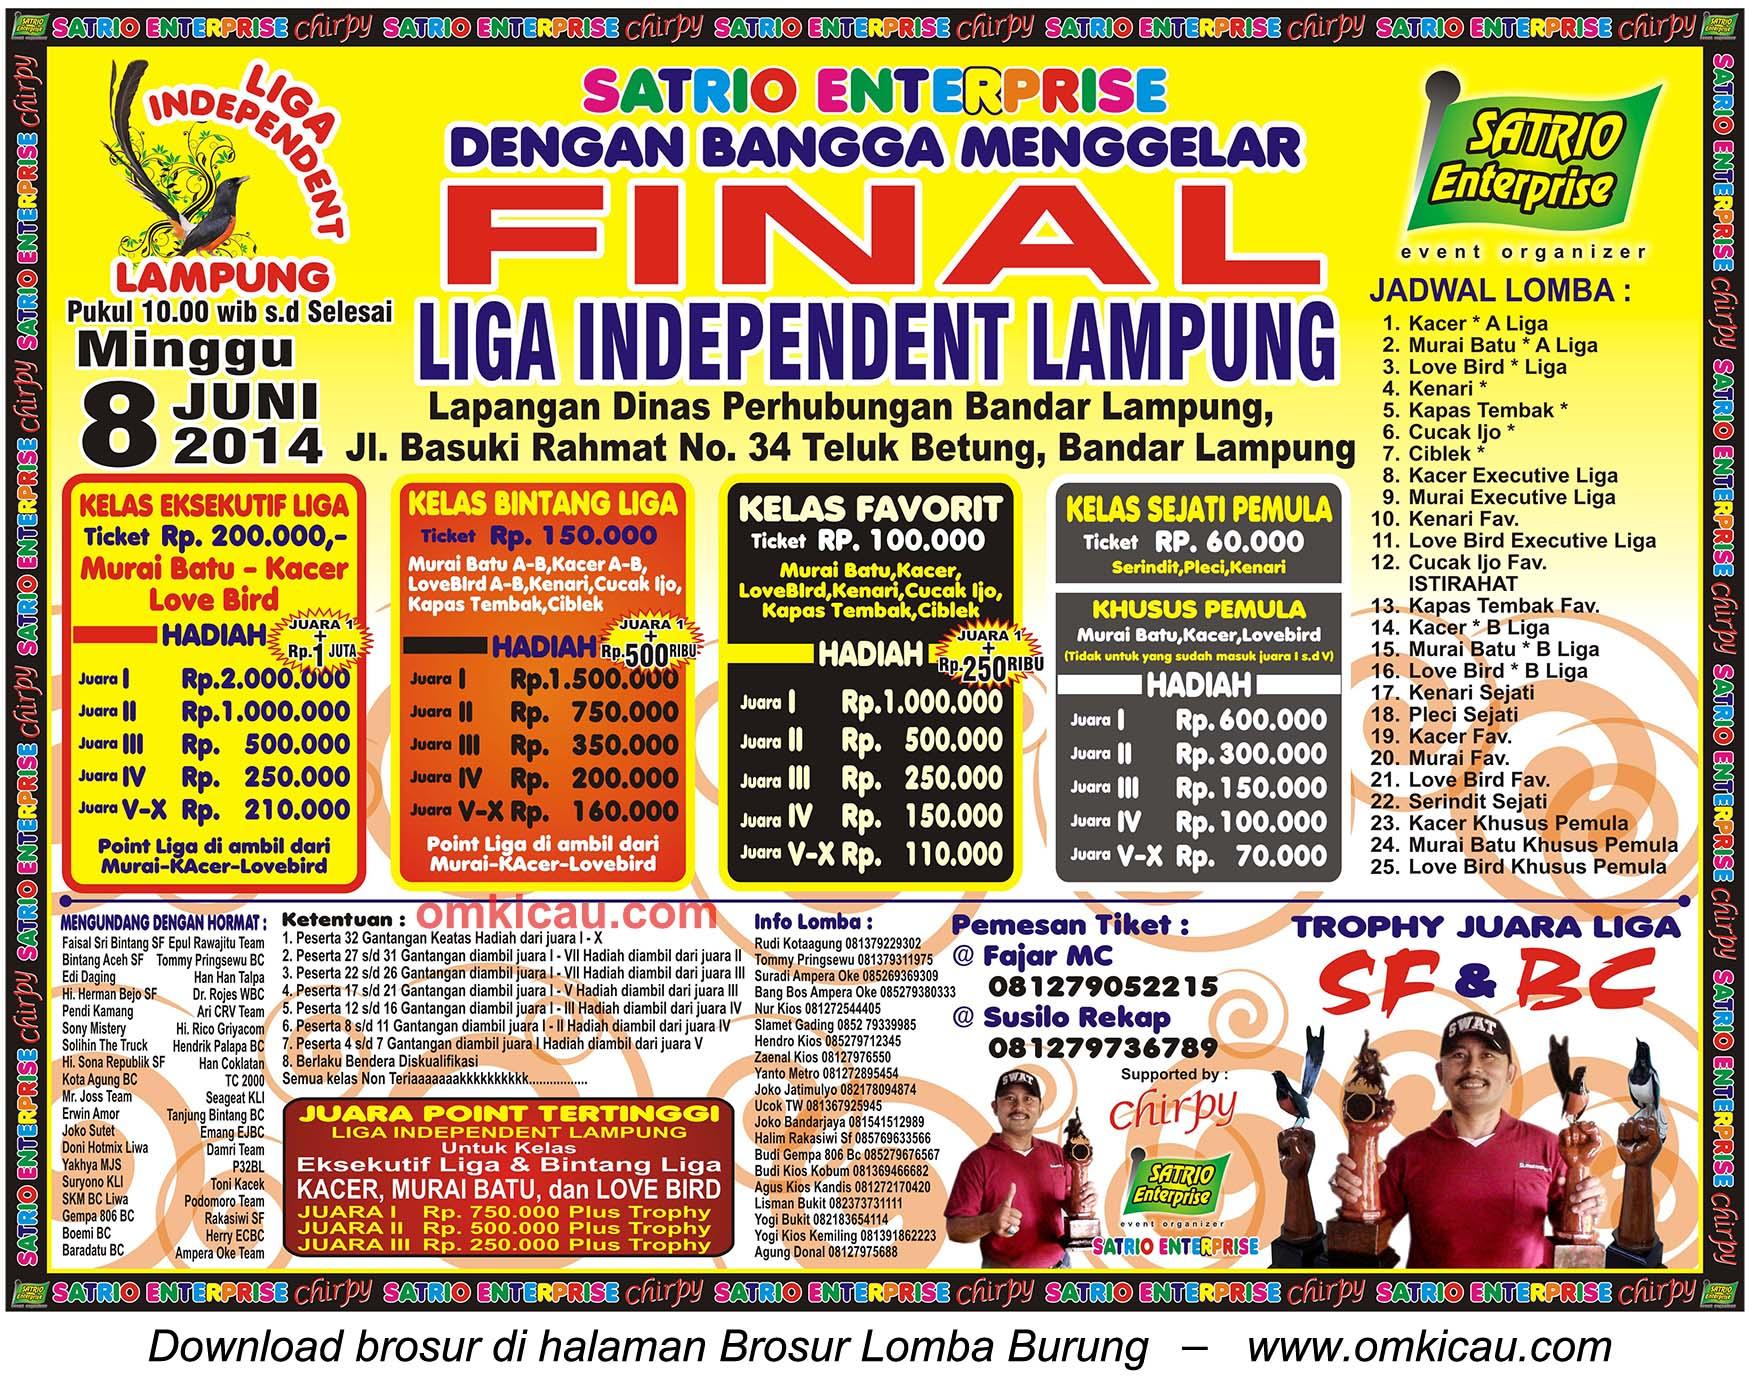 Brosur Lomba Burung Berkicau Final Liga Independent Lampung, Bandar Lampung, 8 Juni 2014